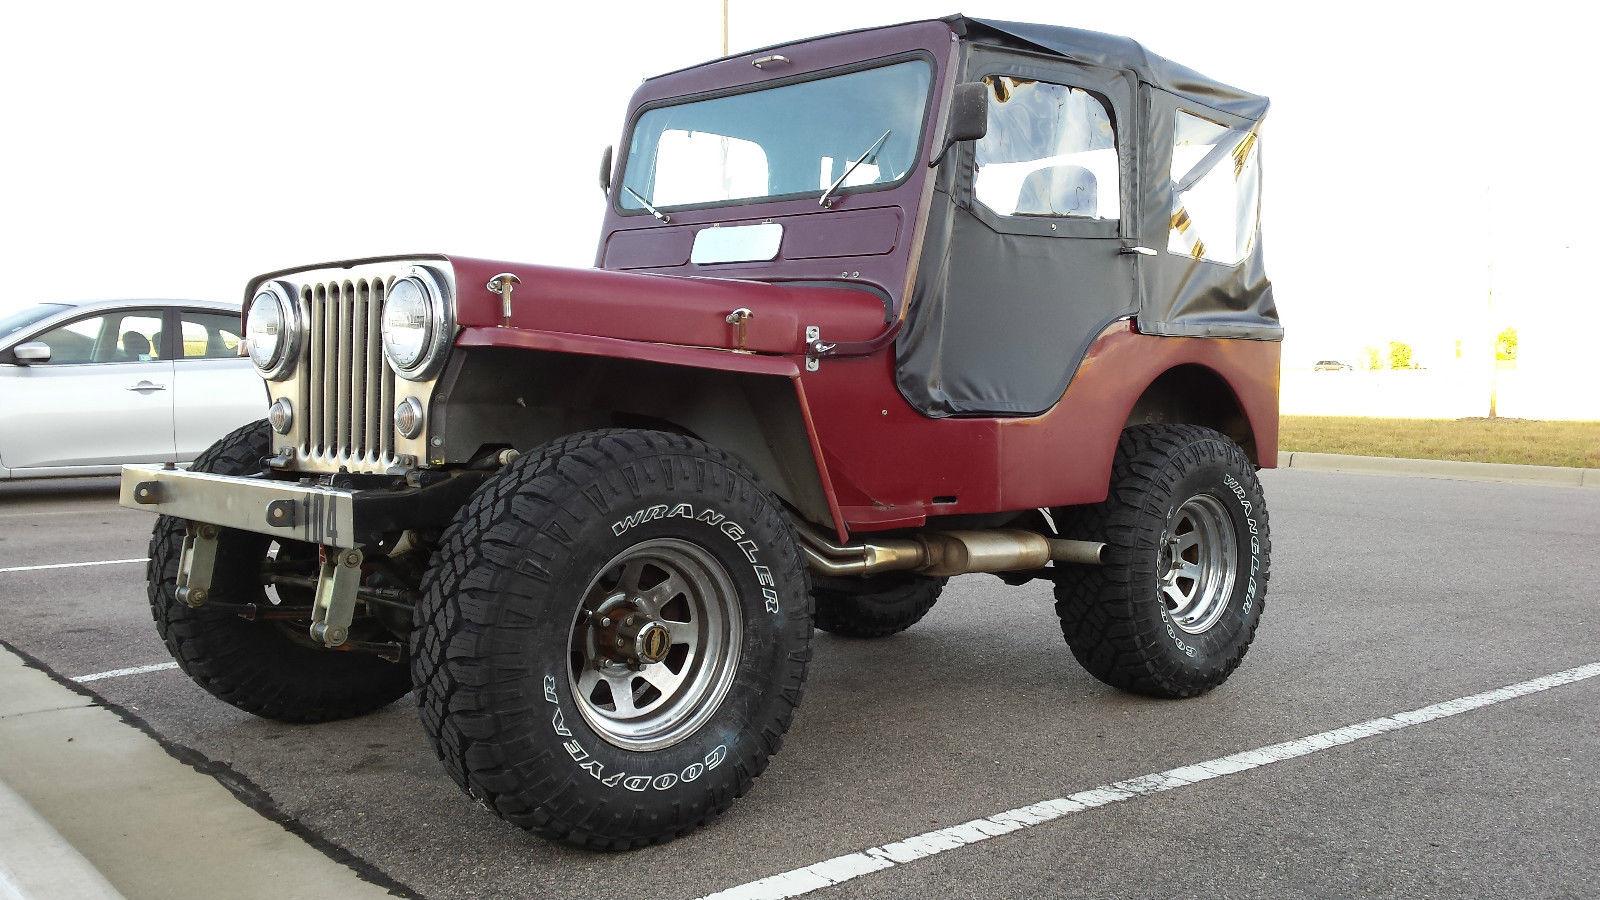 Built 1949 Jeep Willys Cj3a Rock Crawler Dune